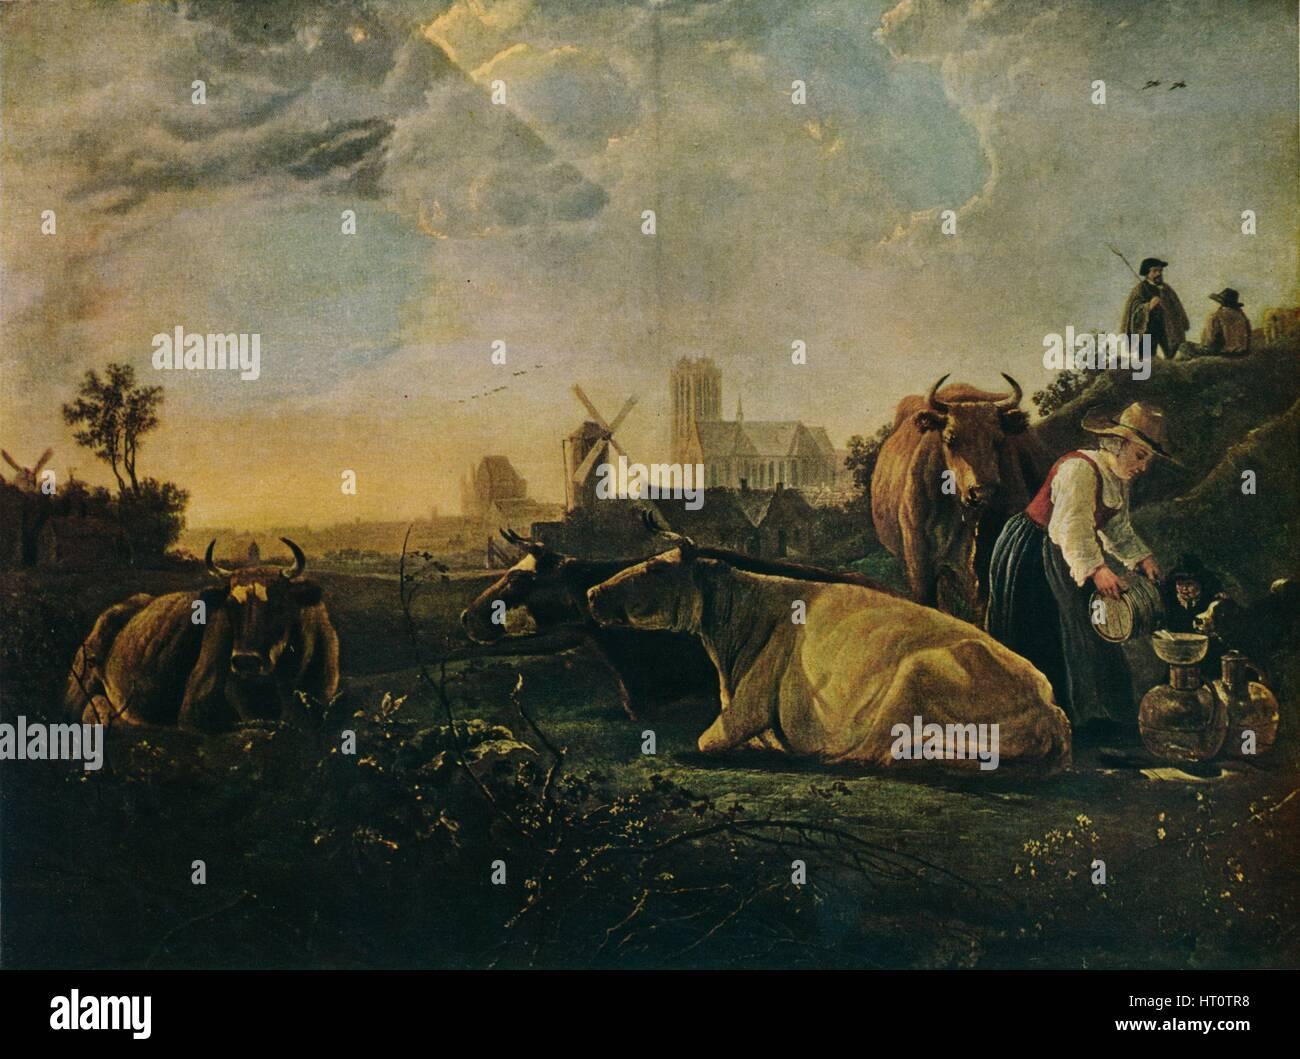 'The Large Dort', c1650. Artist: Aelbert Cuyp. - Stock Image